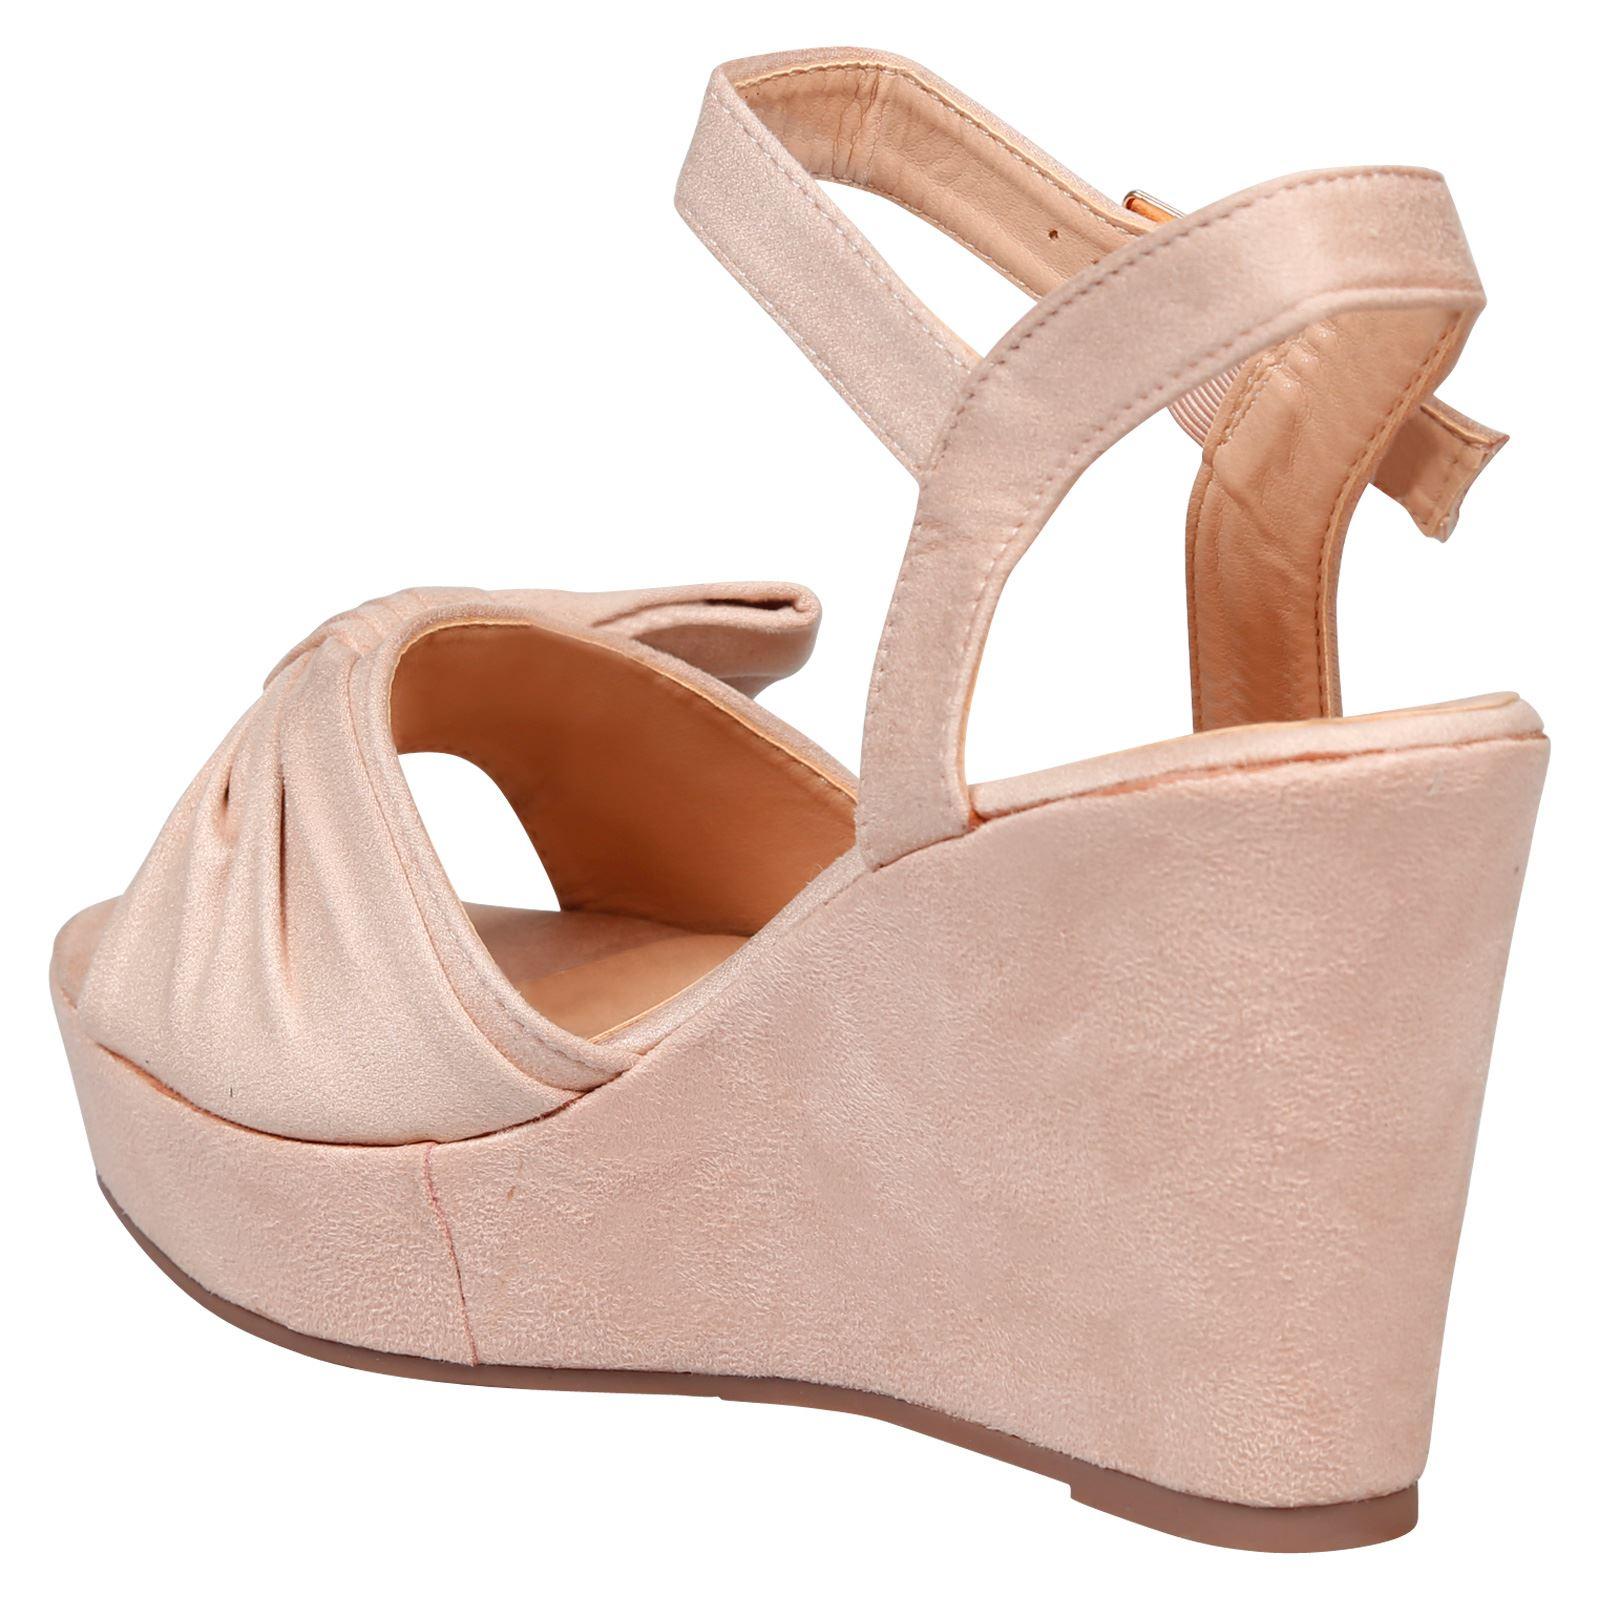 dfd8af0ad55c Details about Elora Ladies Shoes High Wedges Heels Platforms Womens Fashion  Sandals Shoes Size